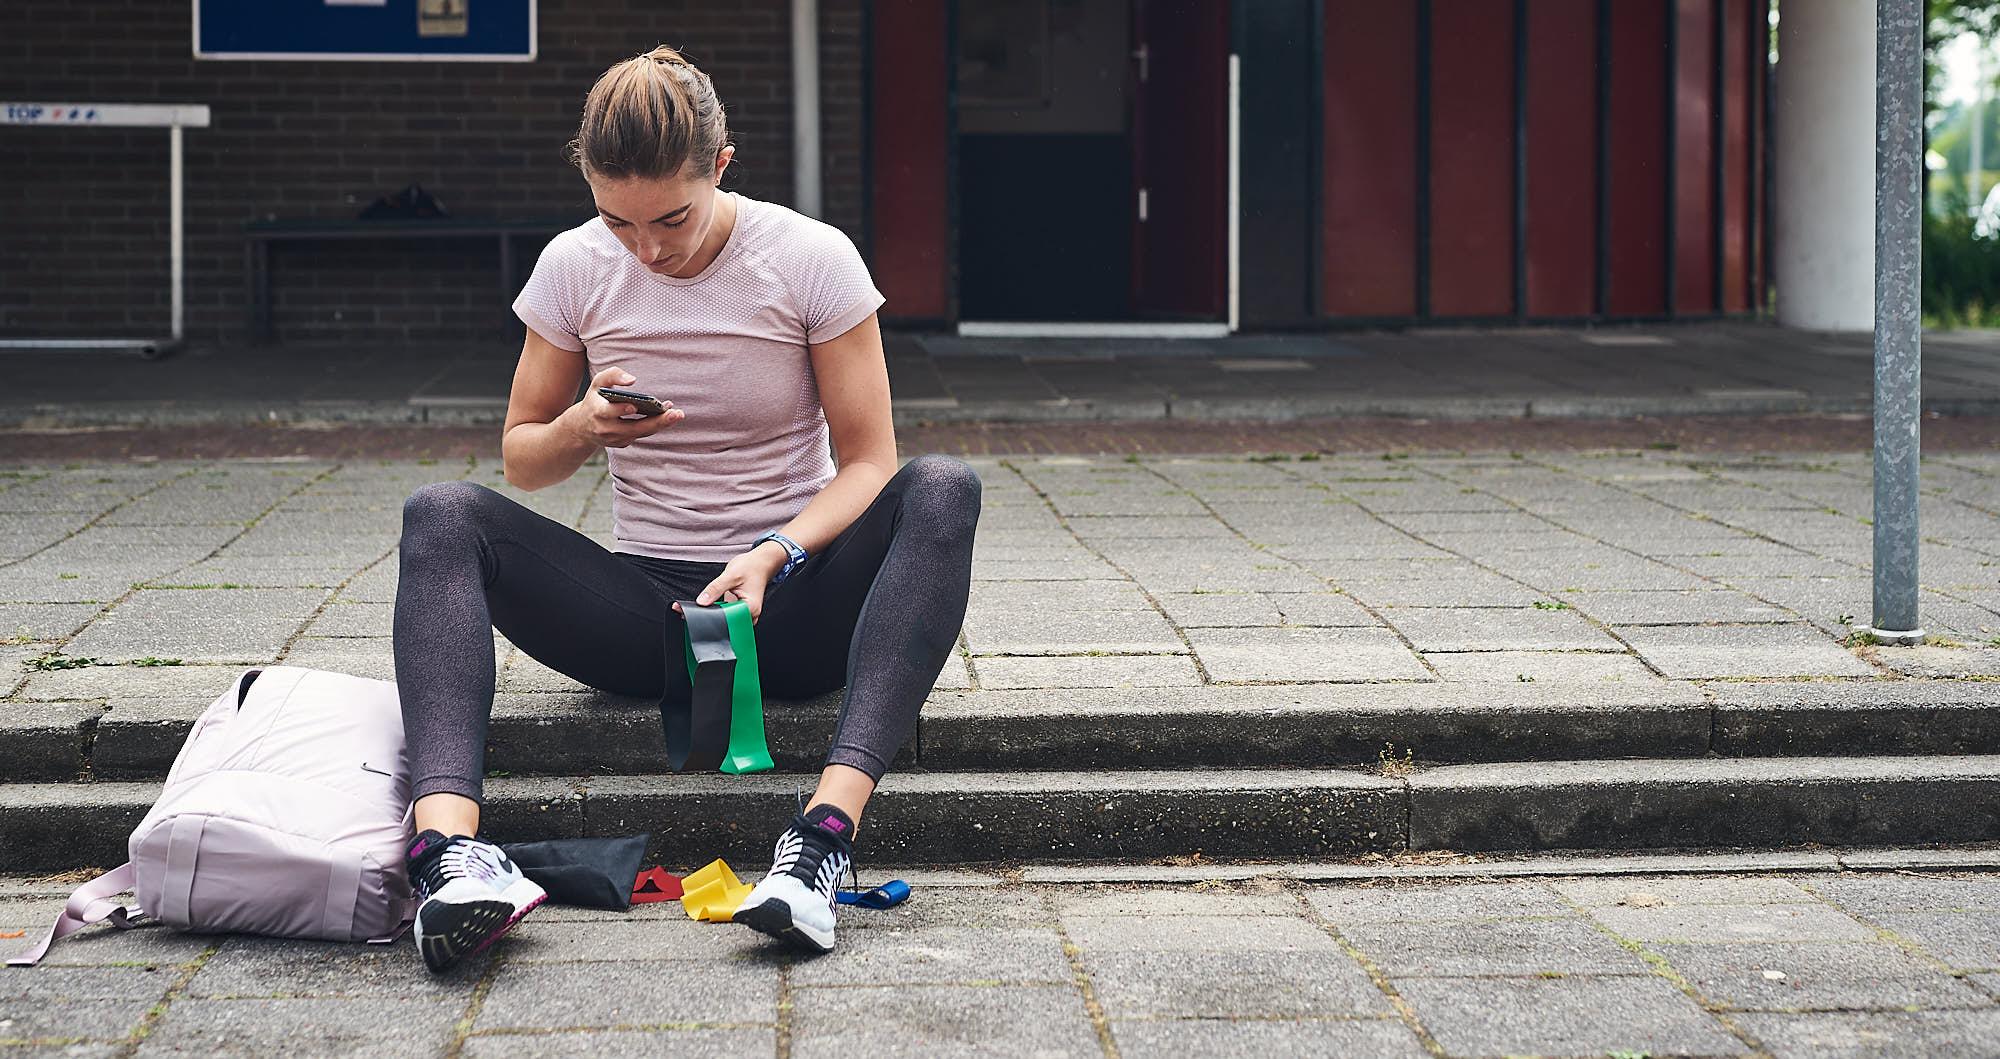 Hurdles athlete Bianca Baak preparing for training